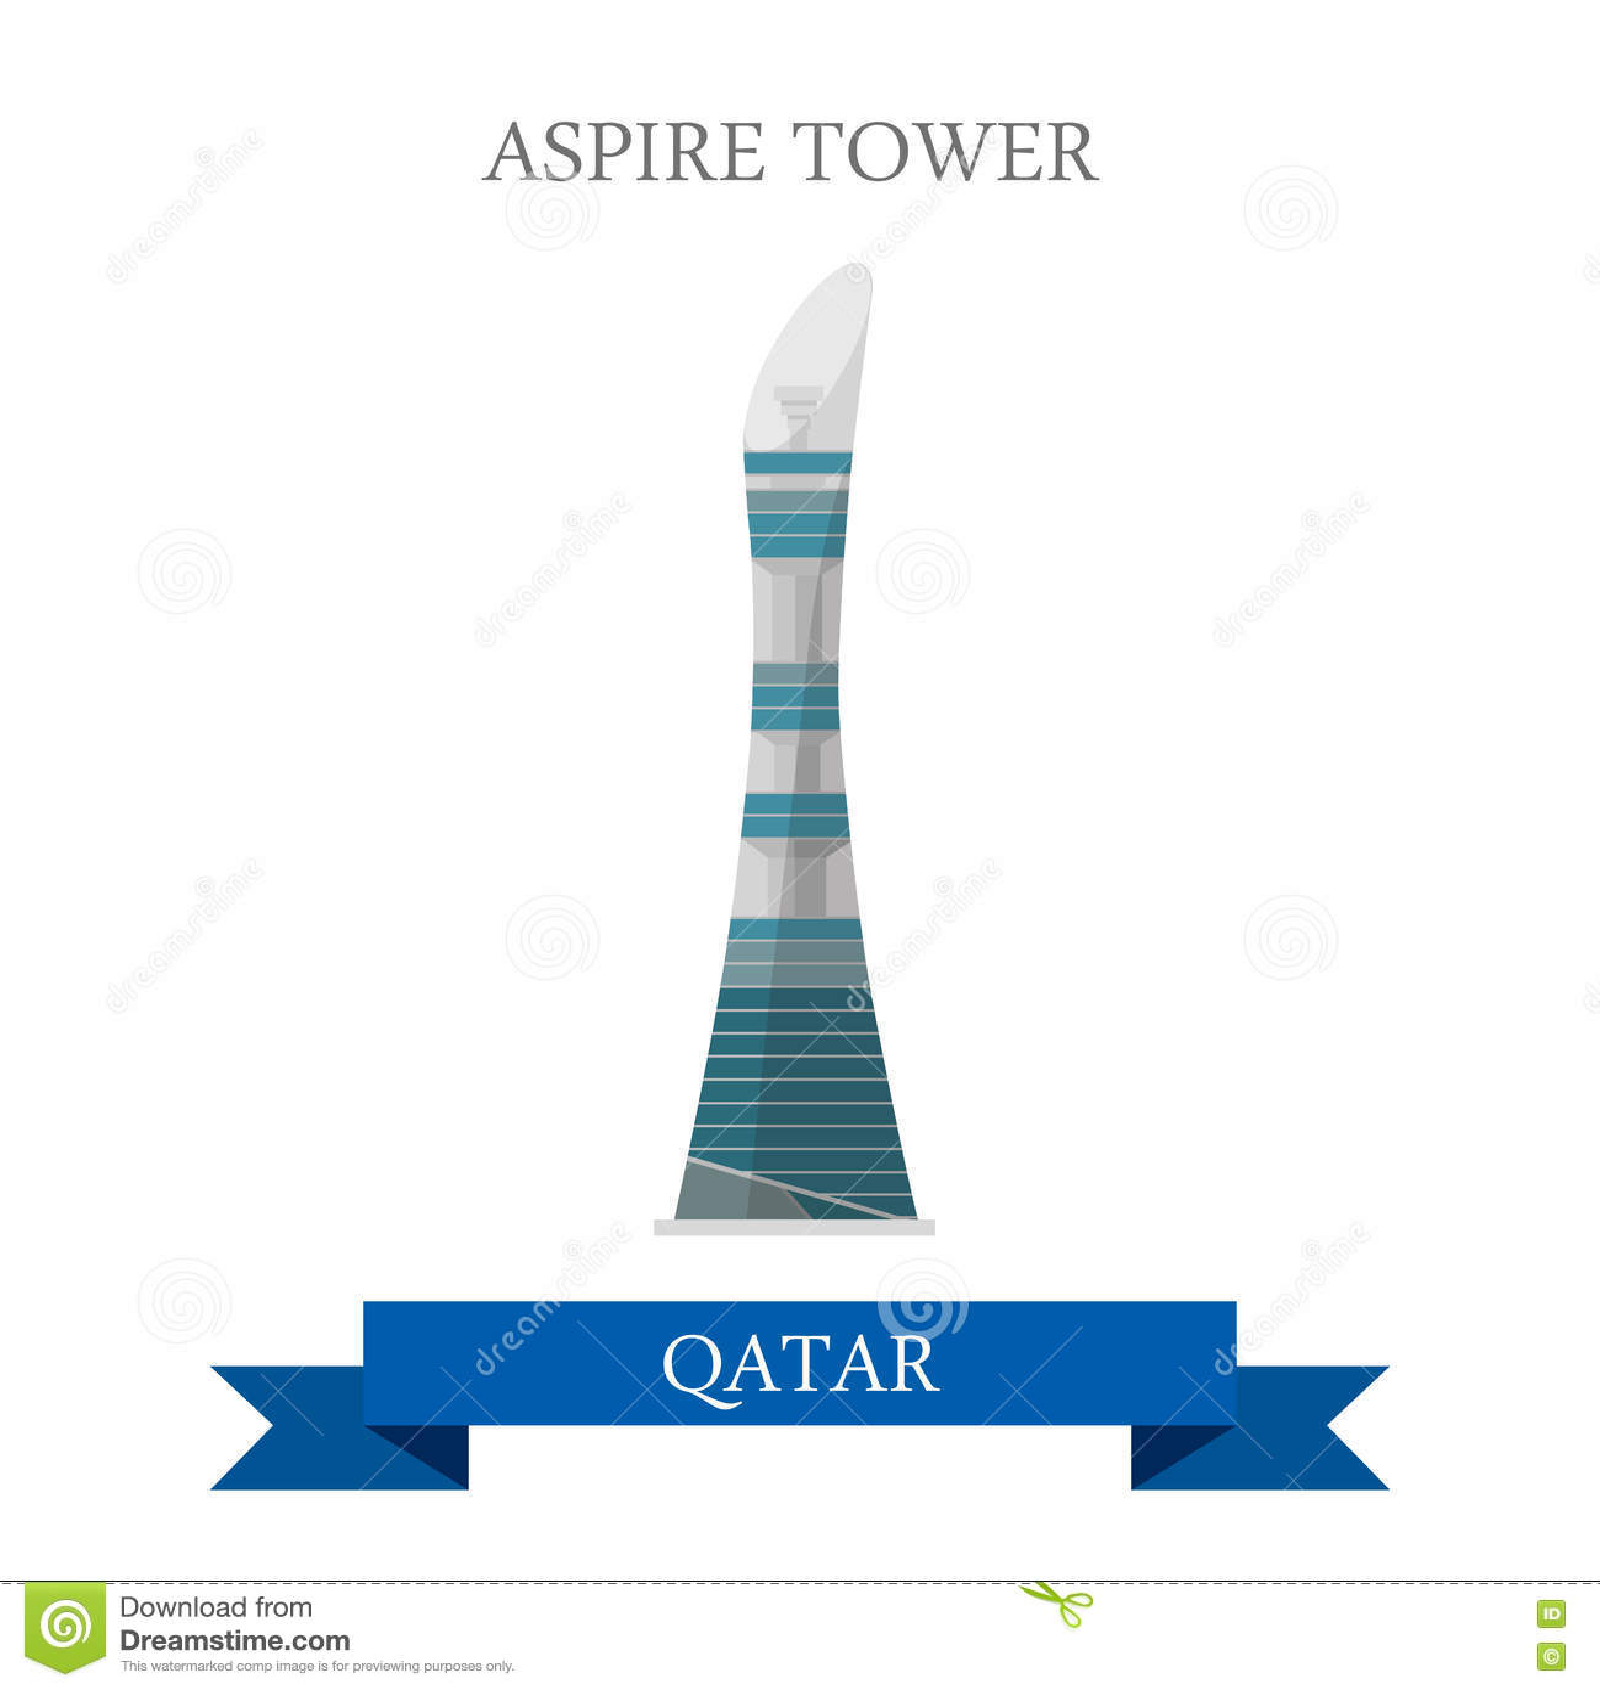 Aspire Tower Qatar vector flat attraction travel landmark